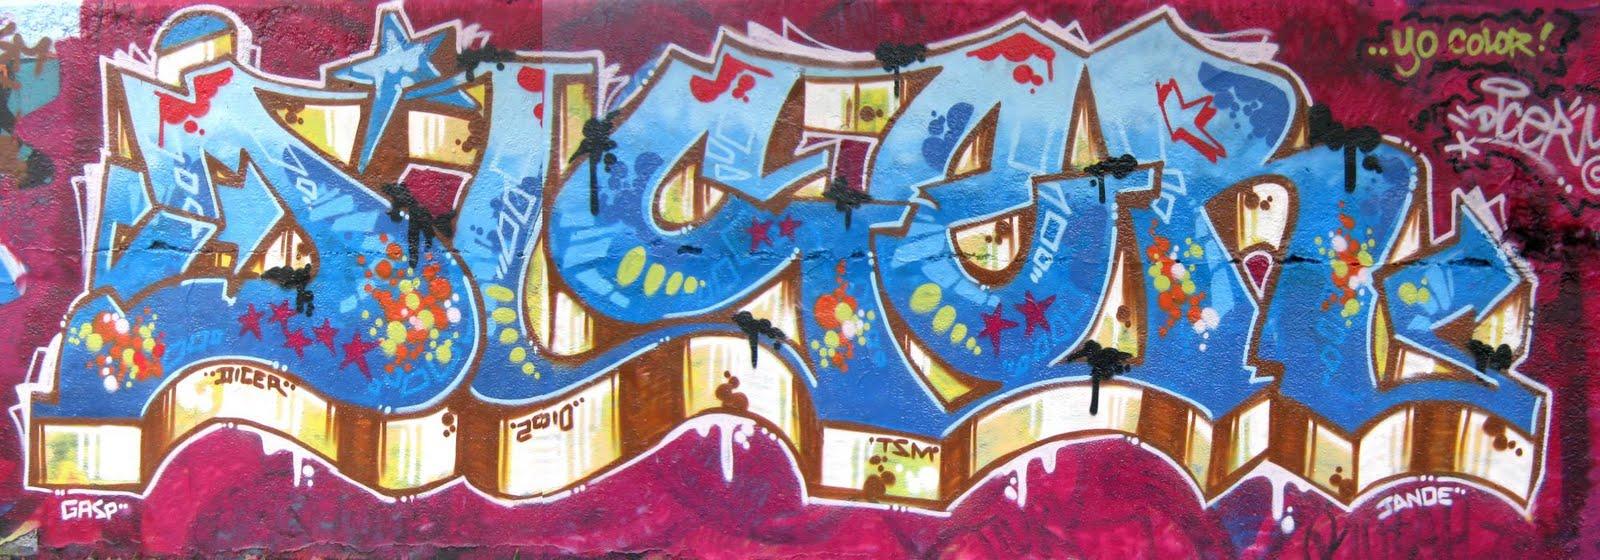 The kool skool interviews south london writer dicer tsm author of new steel canvas 1987 1995 london underground train graffiti book